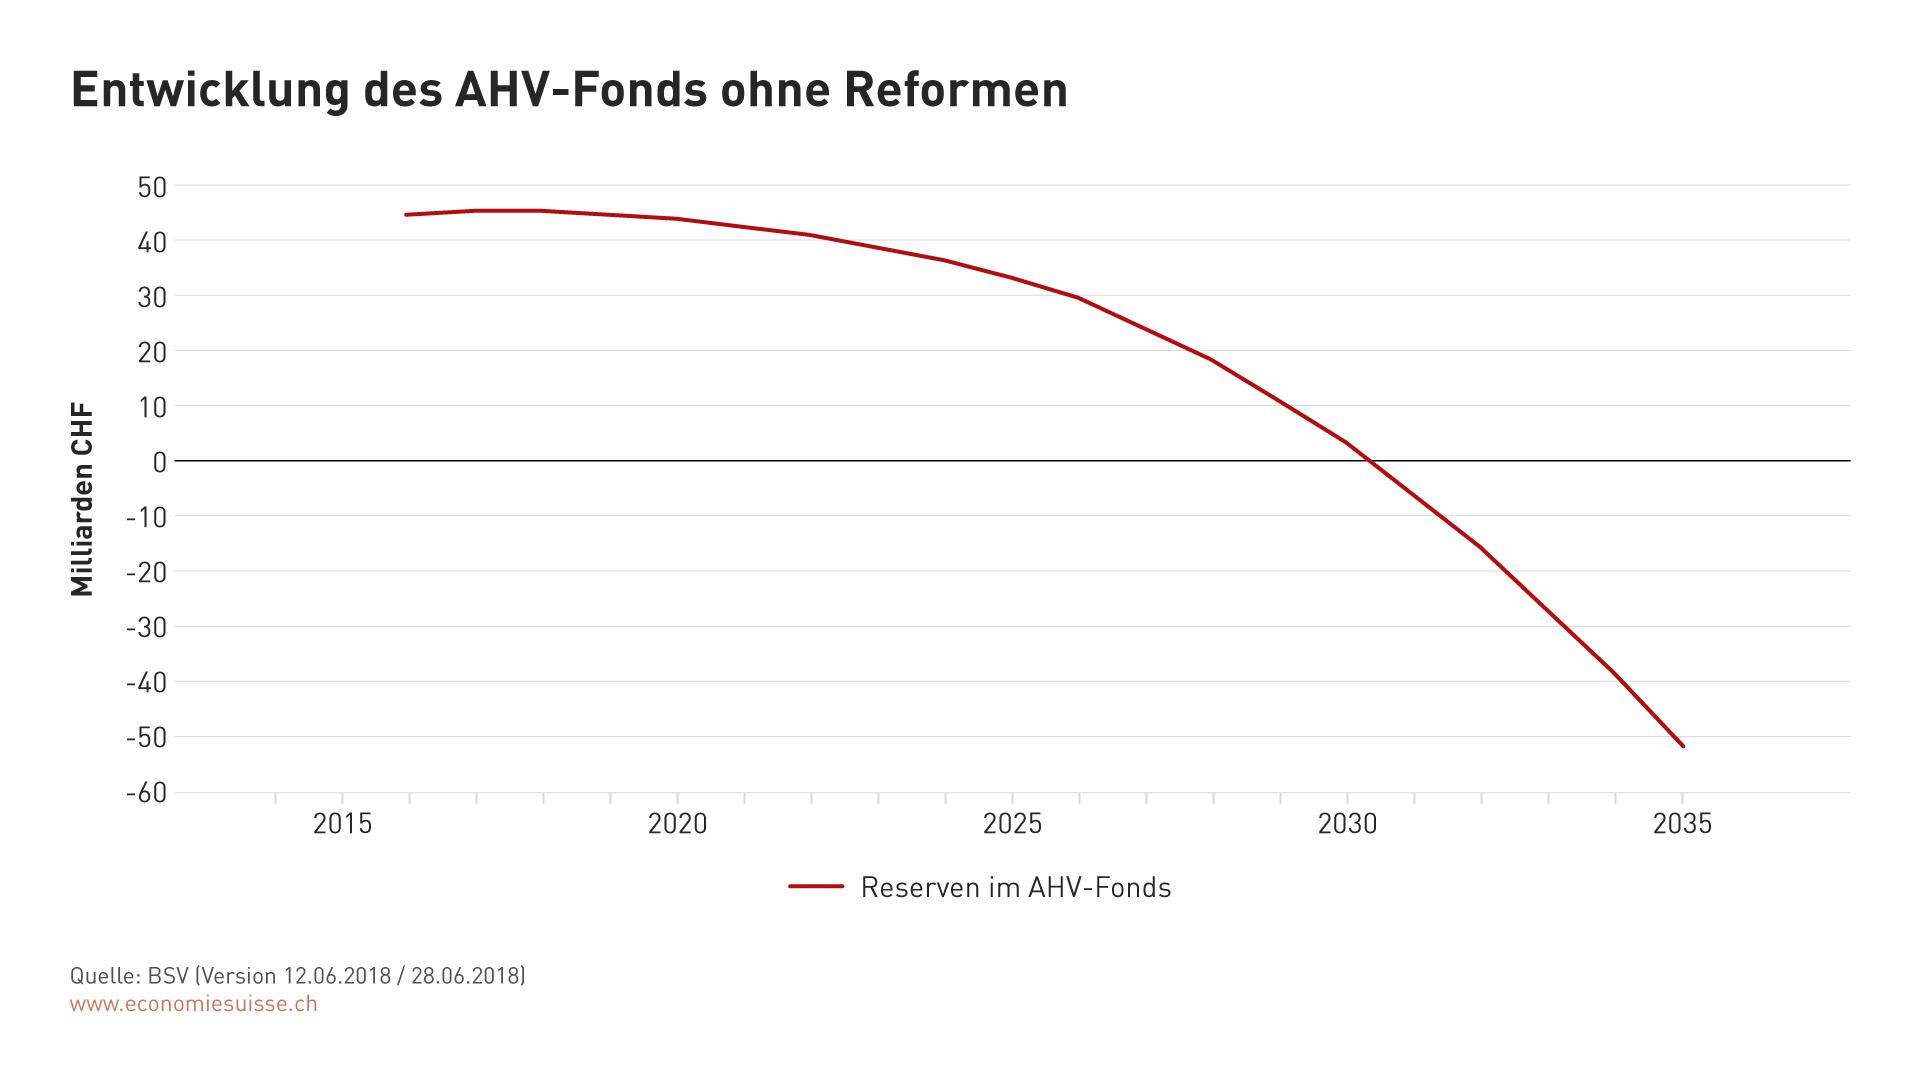 Entwicklung des AHV-Fonds ohne Reformen